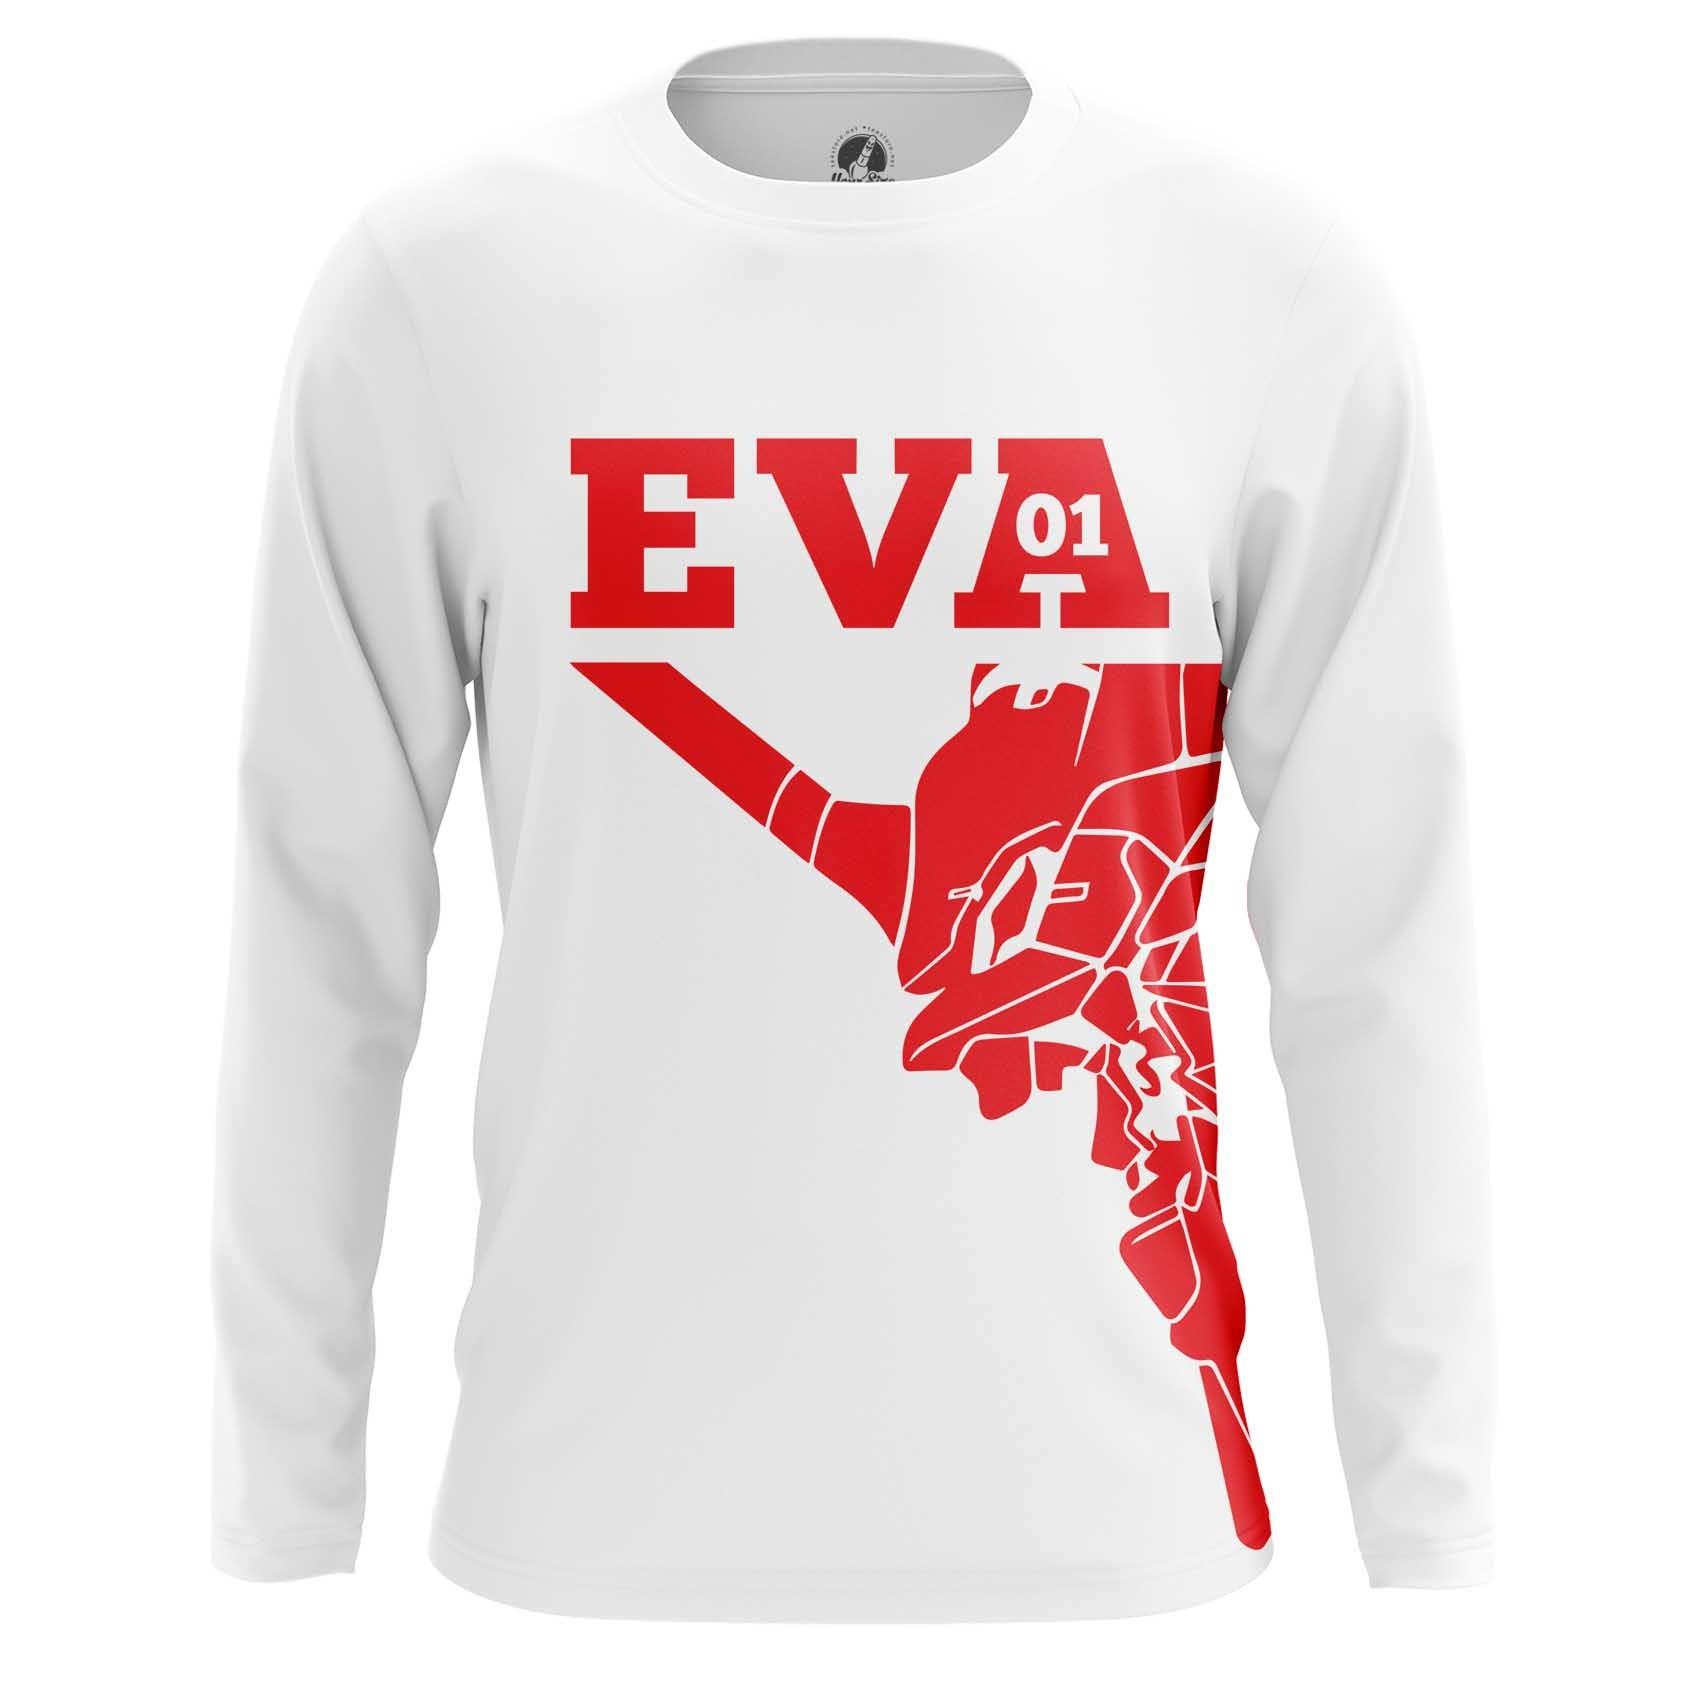 Collectibles T-Shirt Neon Genesis Evangelion Eva